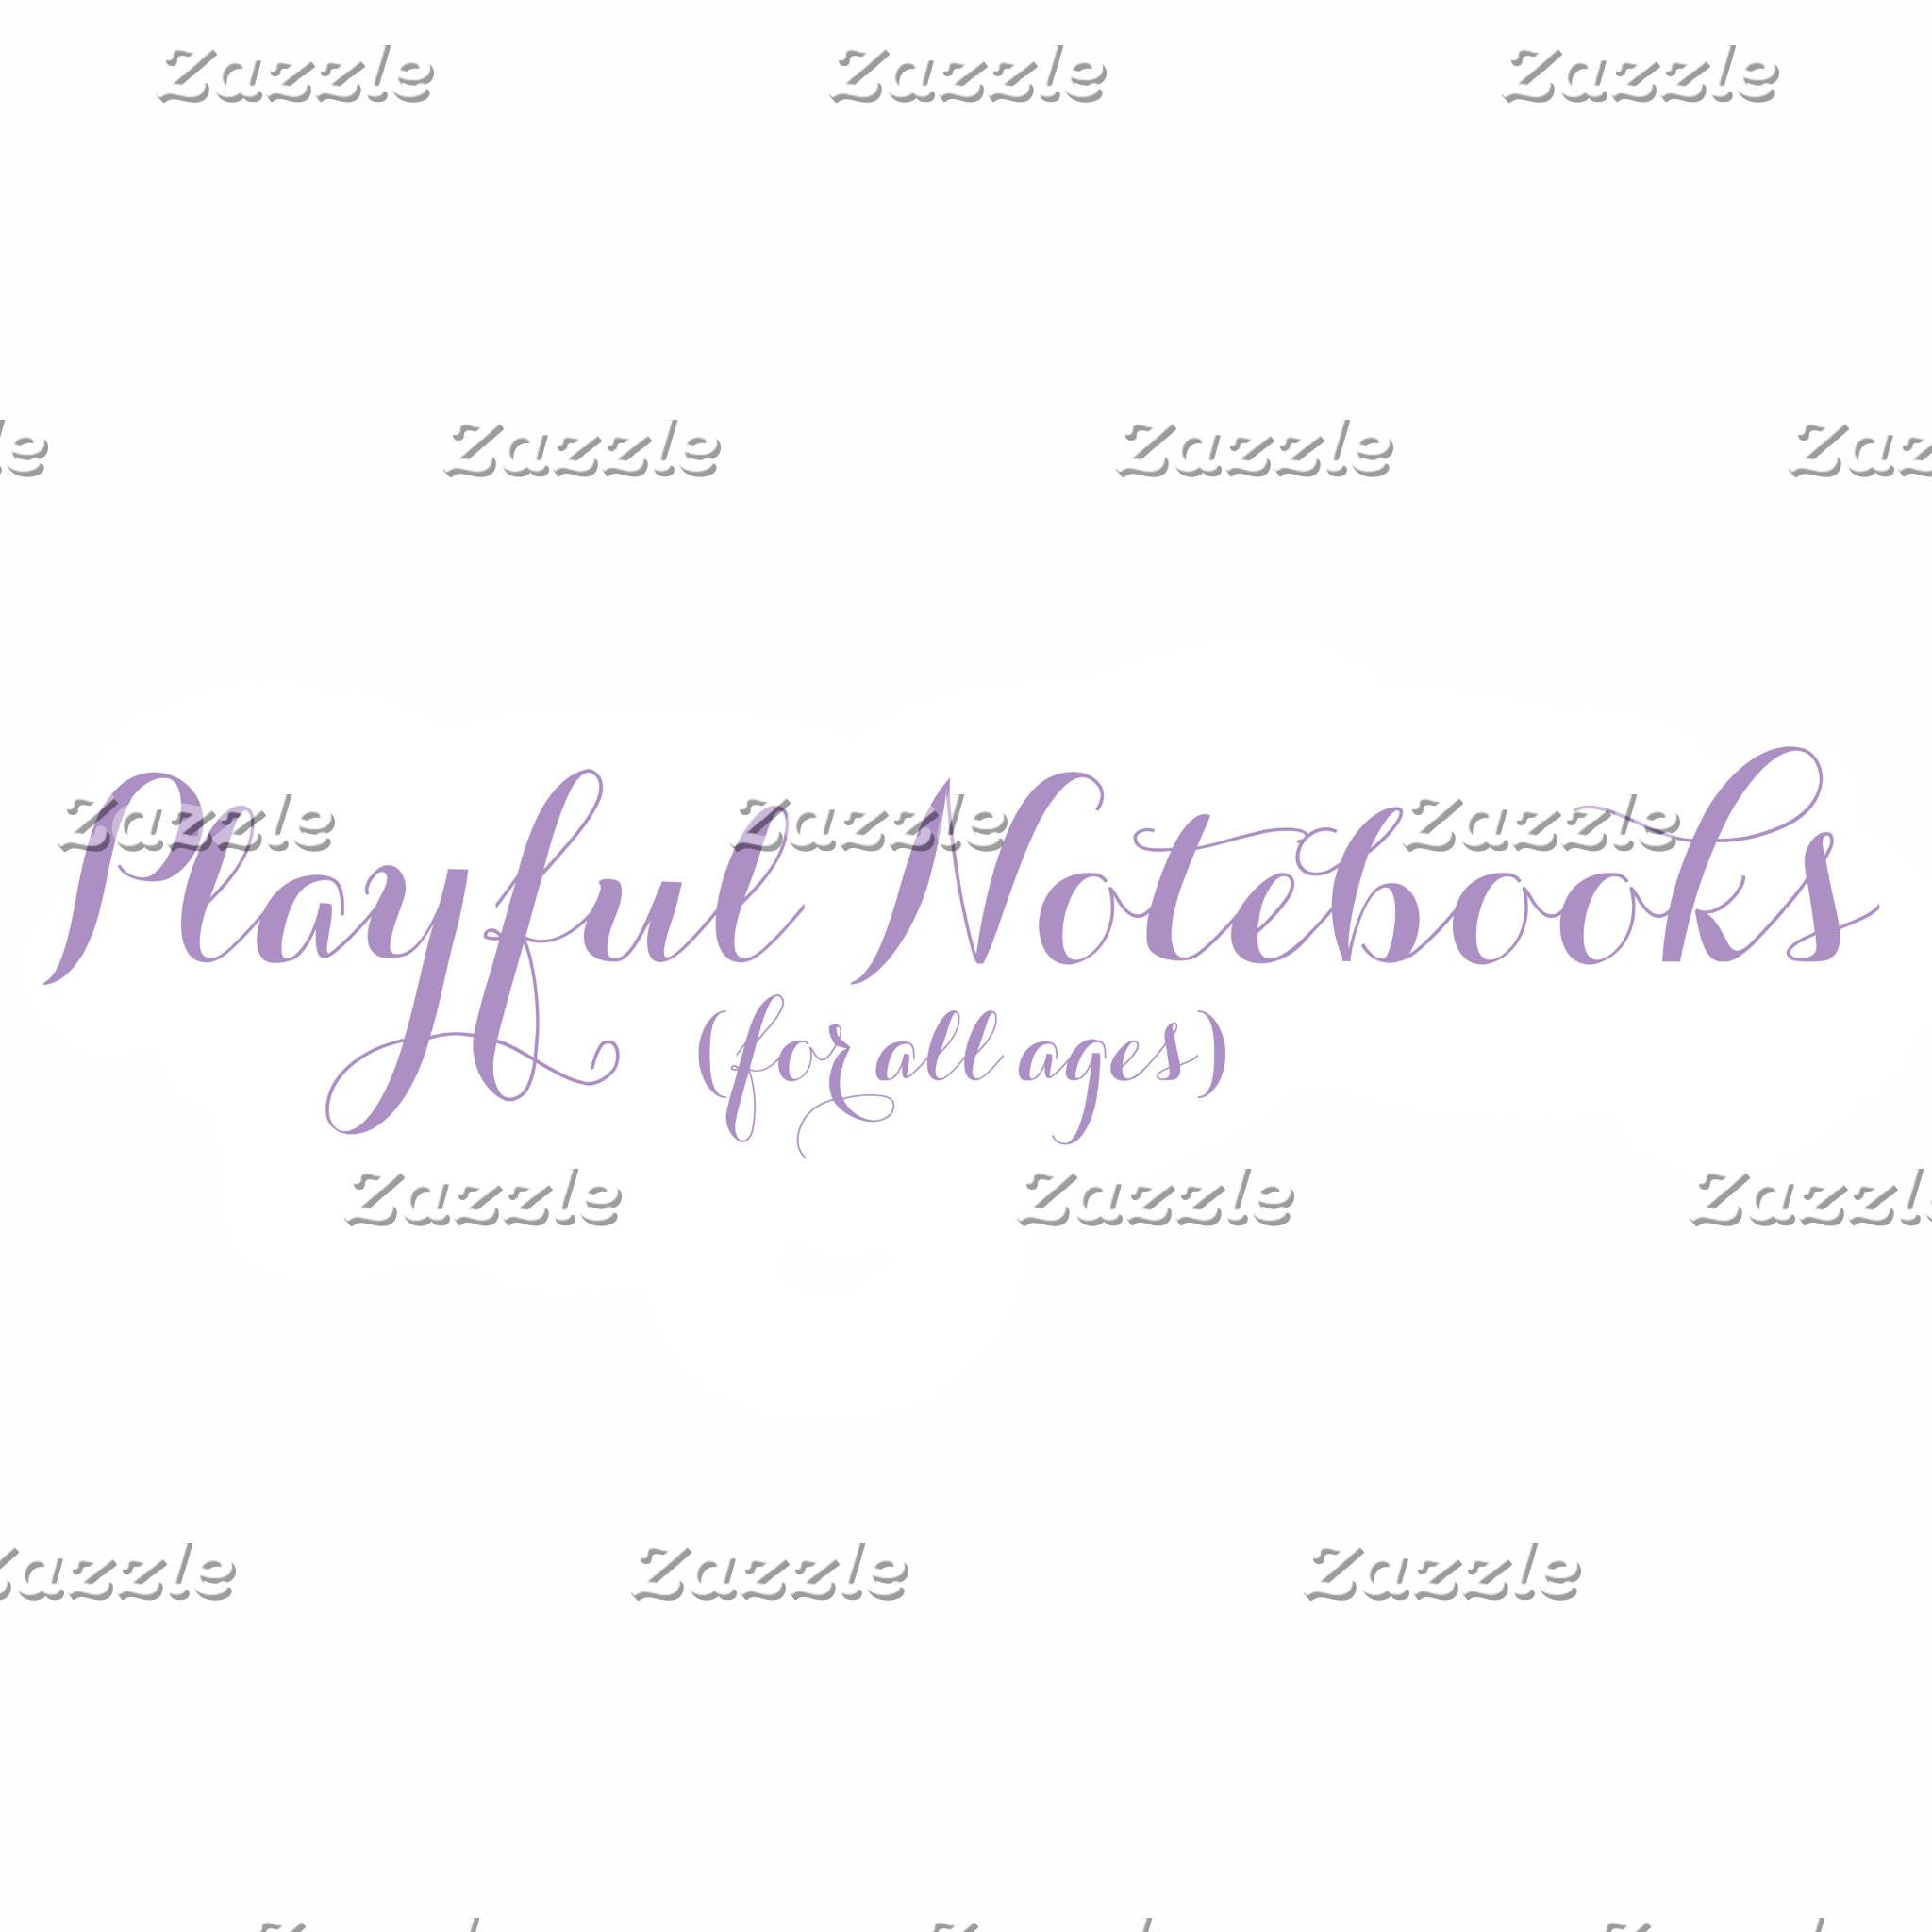 Playful Notebooks